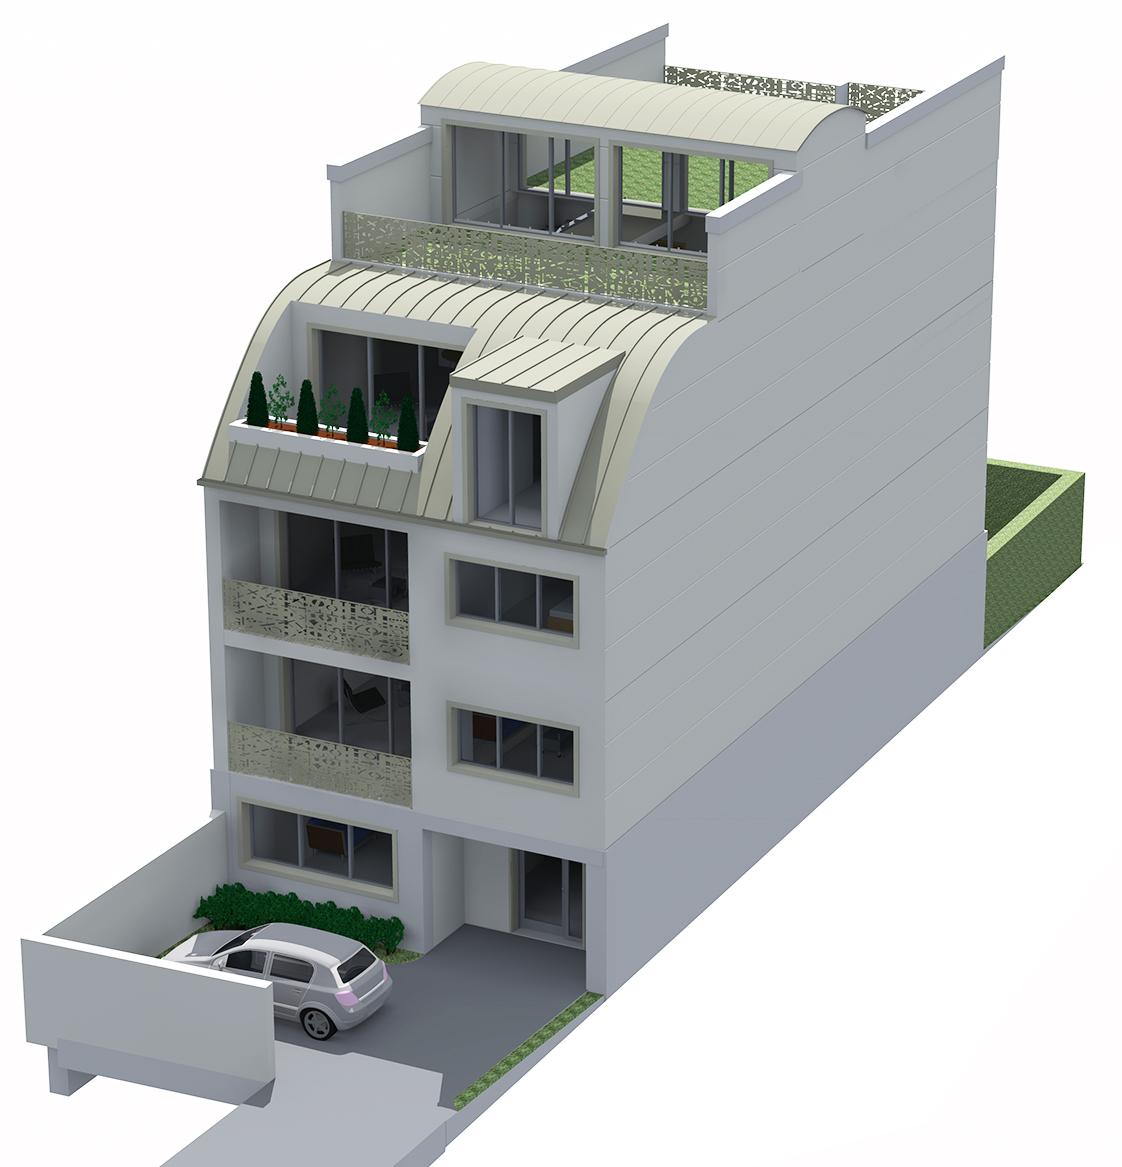 maison chatou yako architecte plaisir 78 yvelines. Black Bedroom Furniture Sets. Home Design Ideas